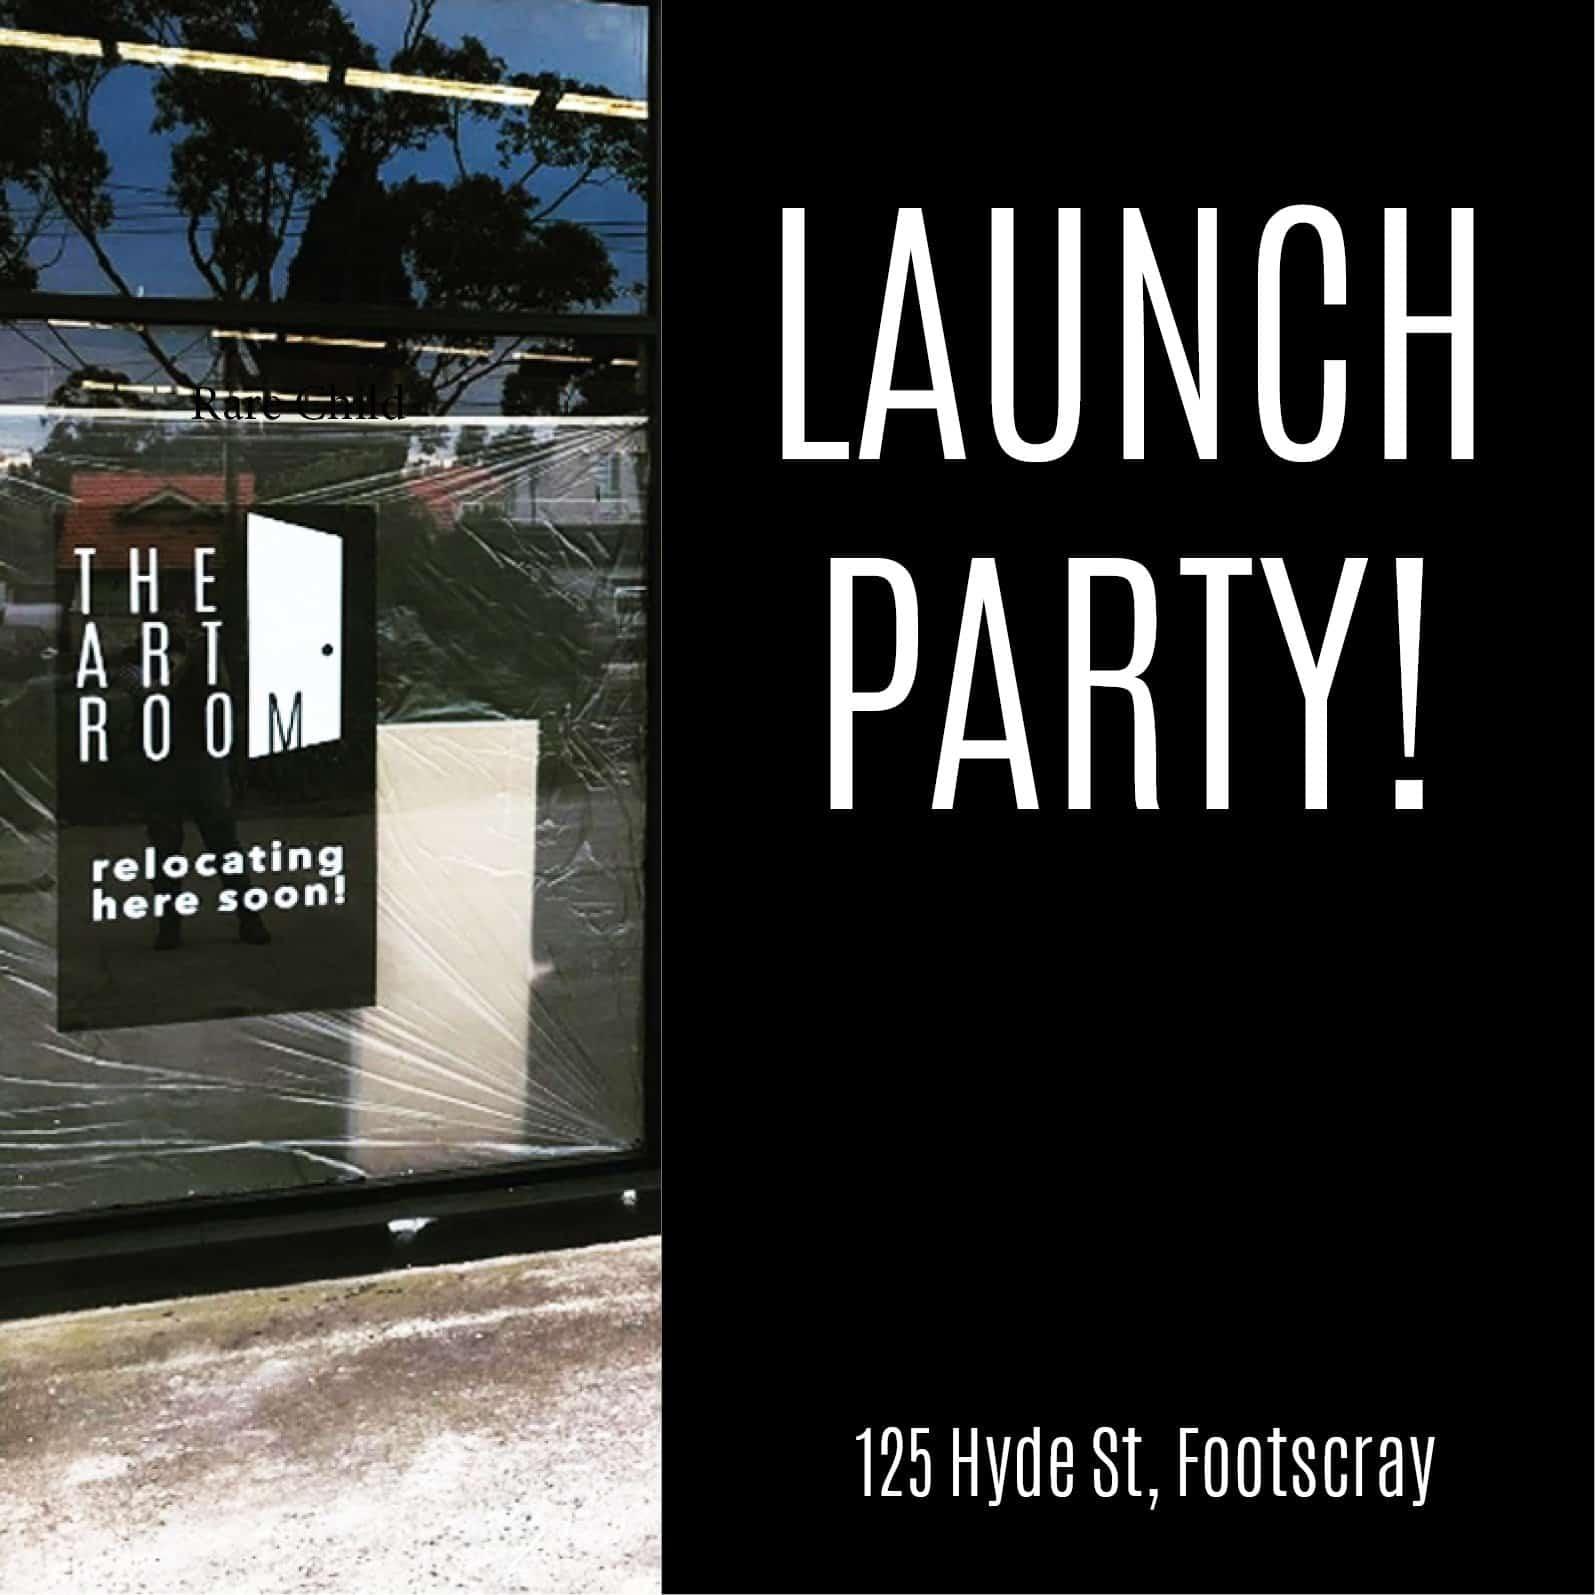 The Art Room - new studio launch party